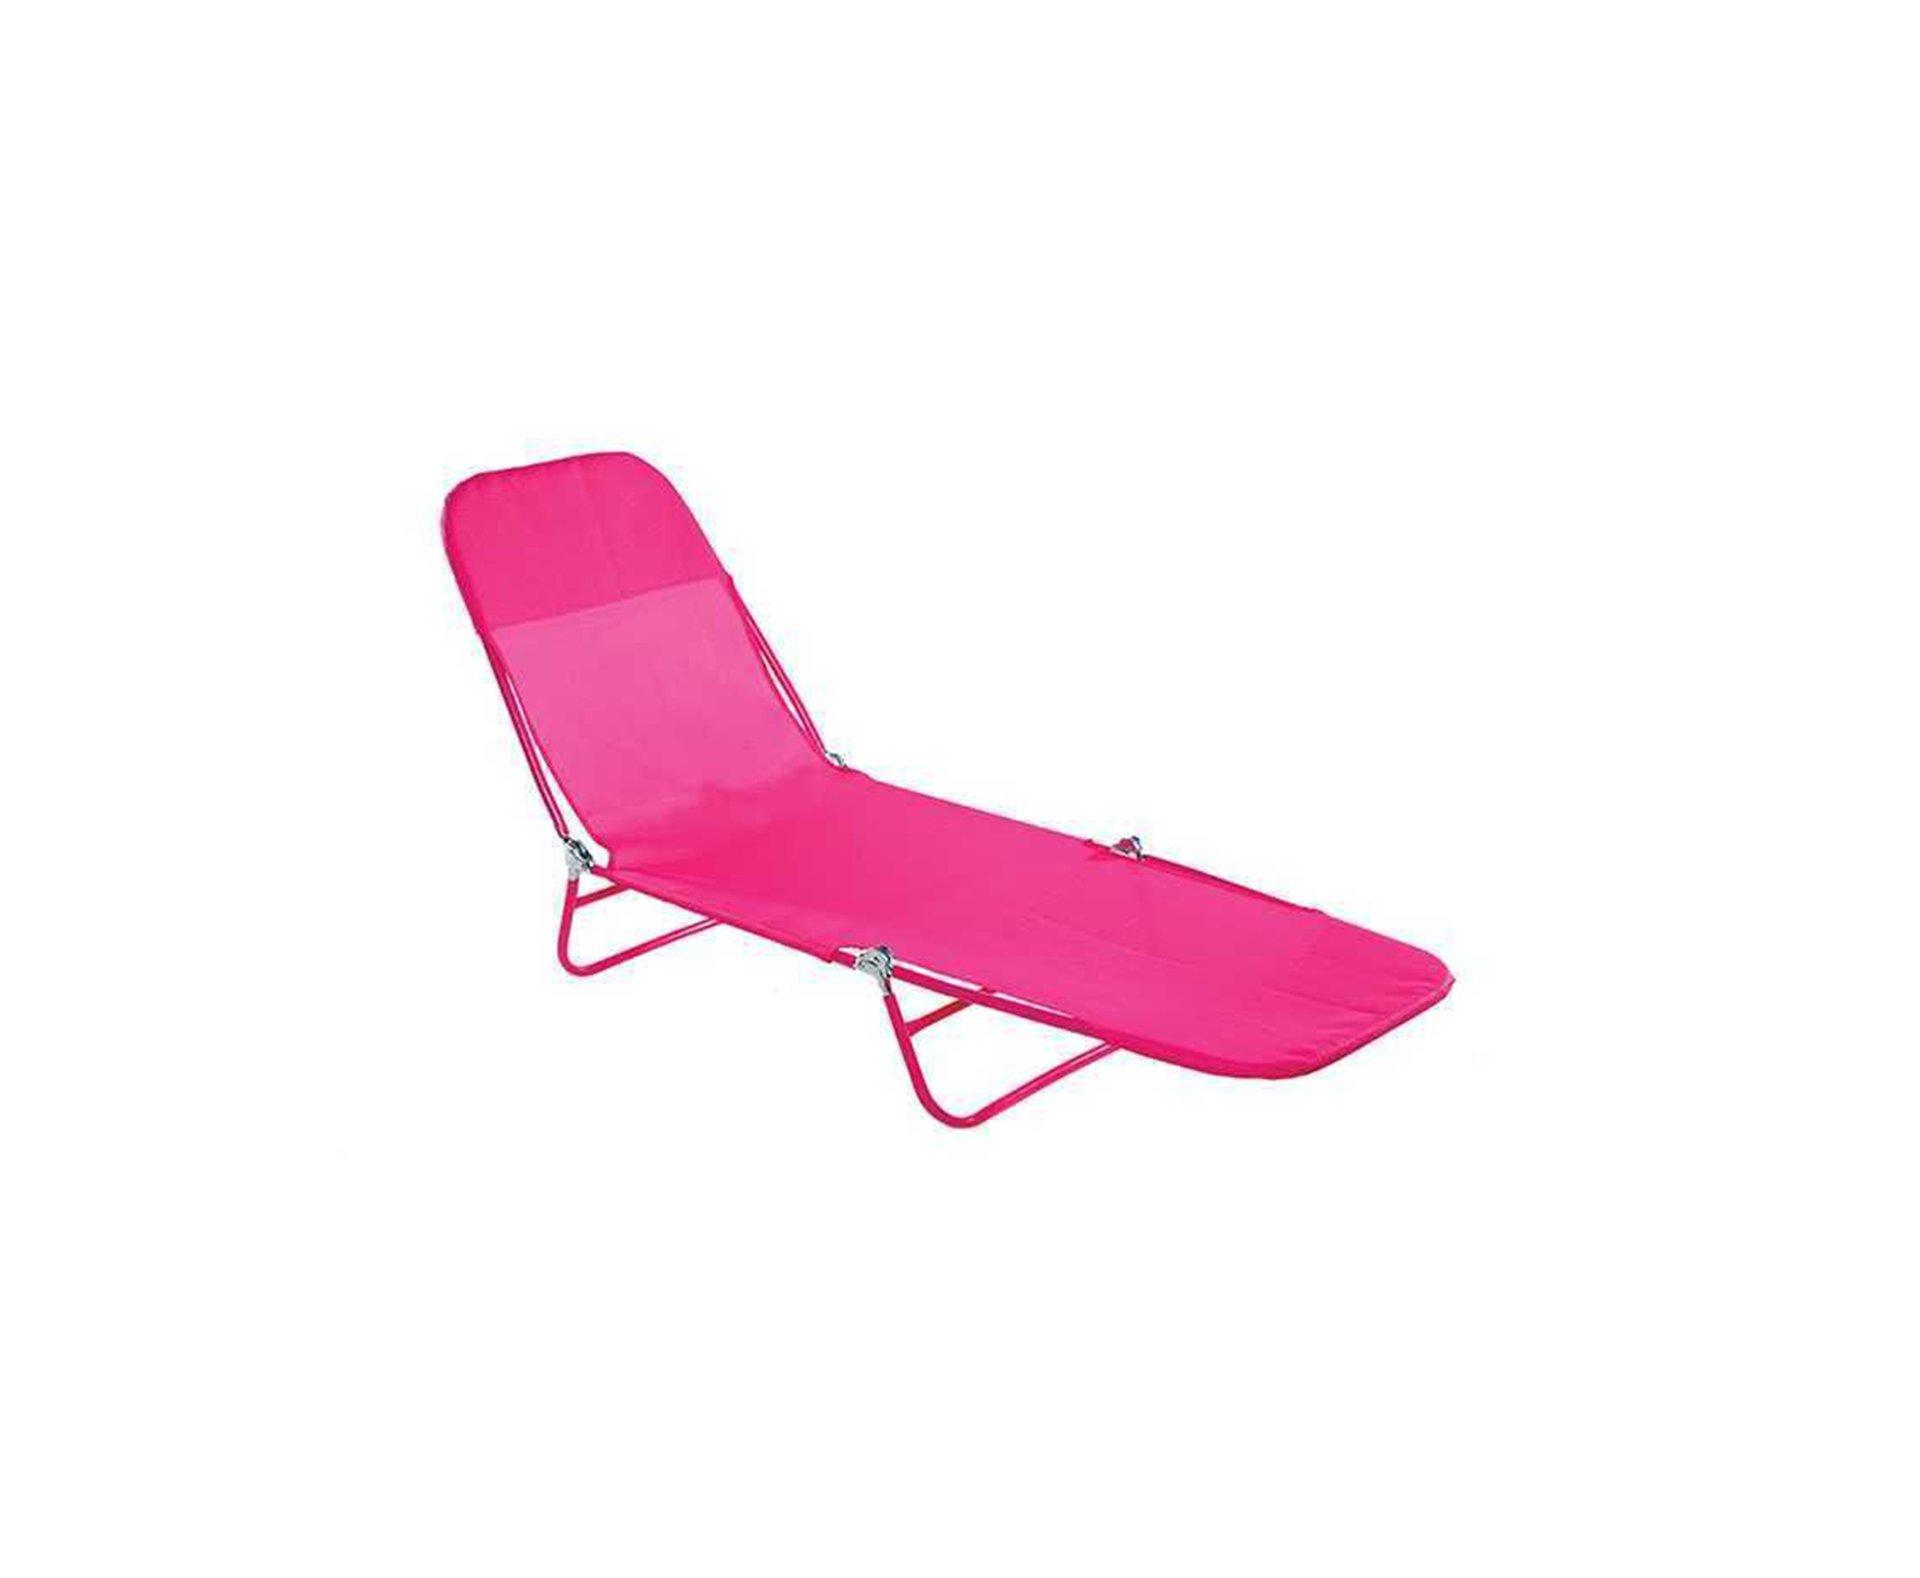 Cadeira Espreguiçadeira Textilene Fashion Rosa - Mor